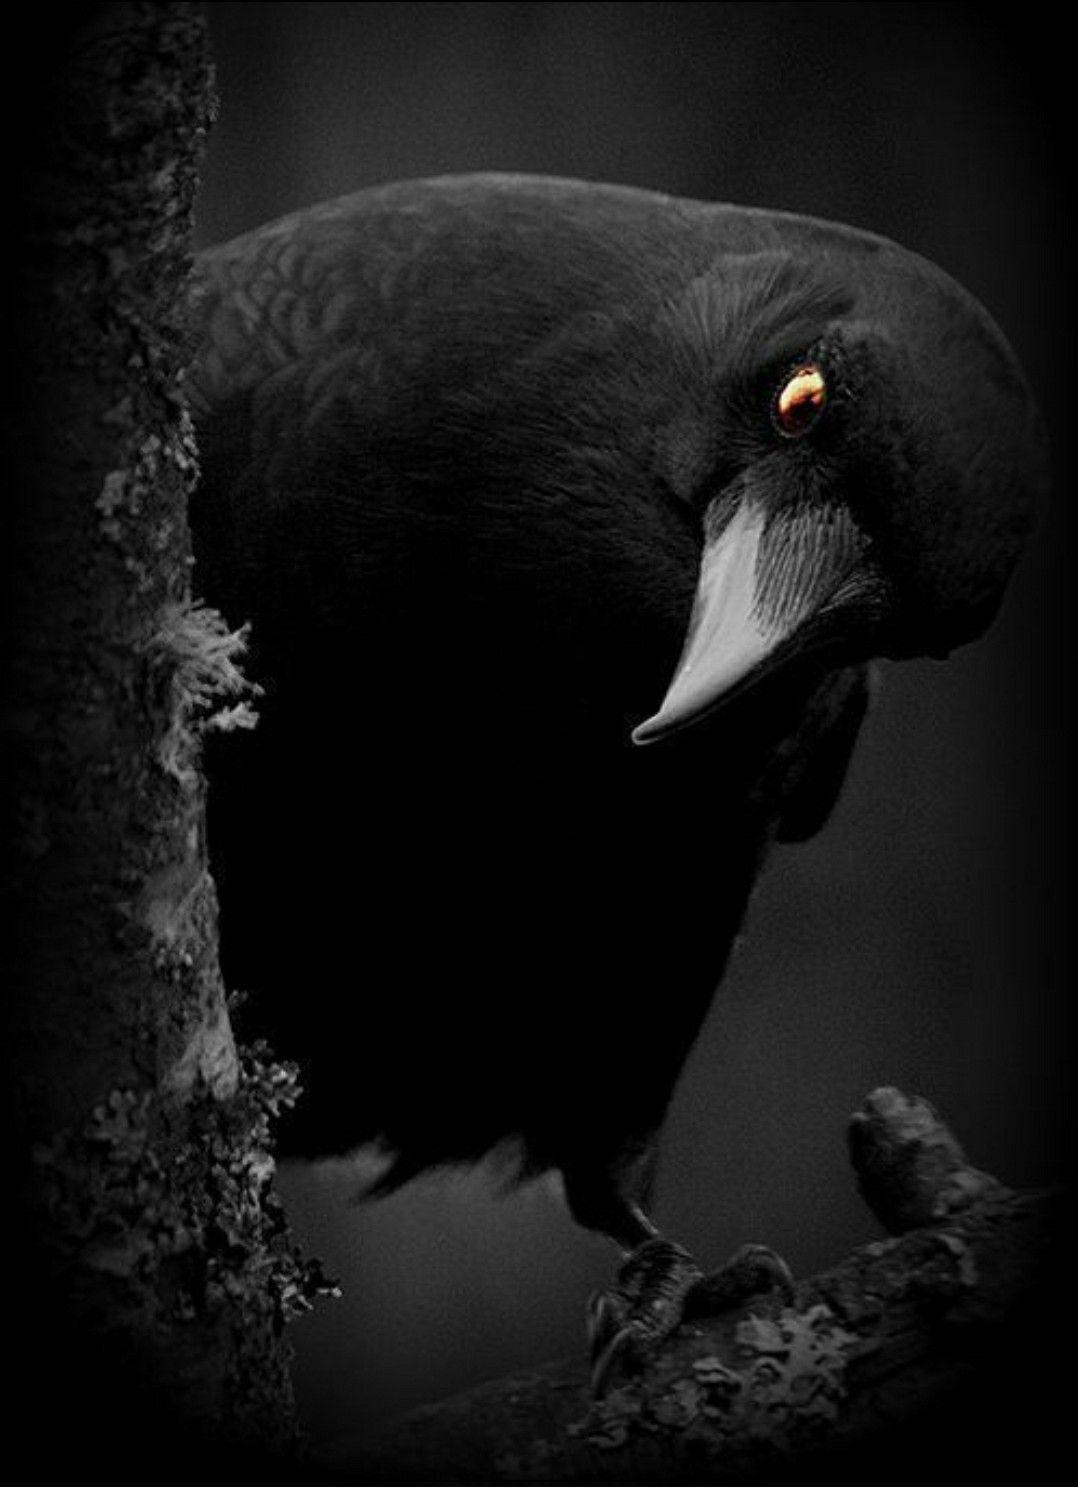 Pin by Kristina Hanna on I Love Birds! in 2020 Animals